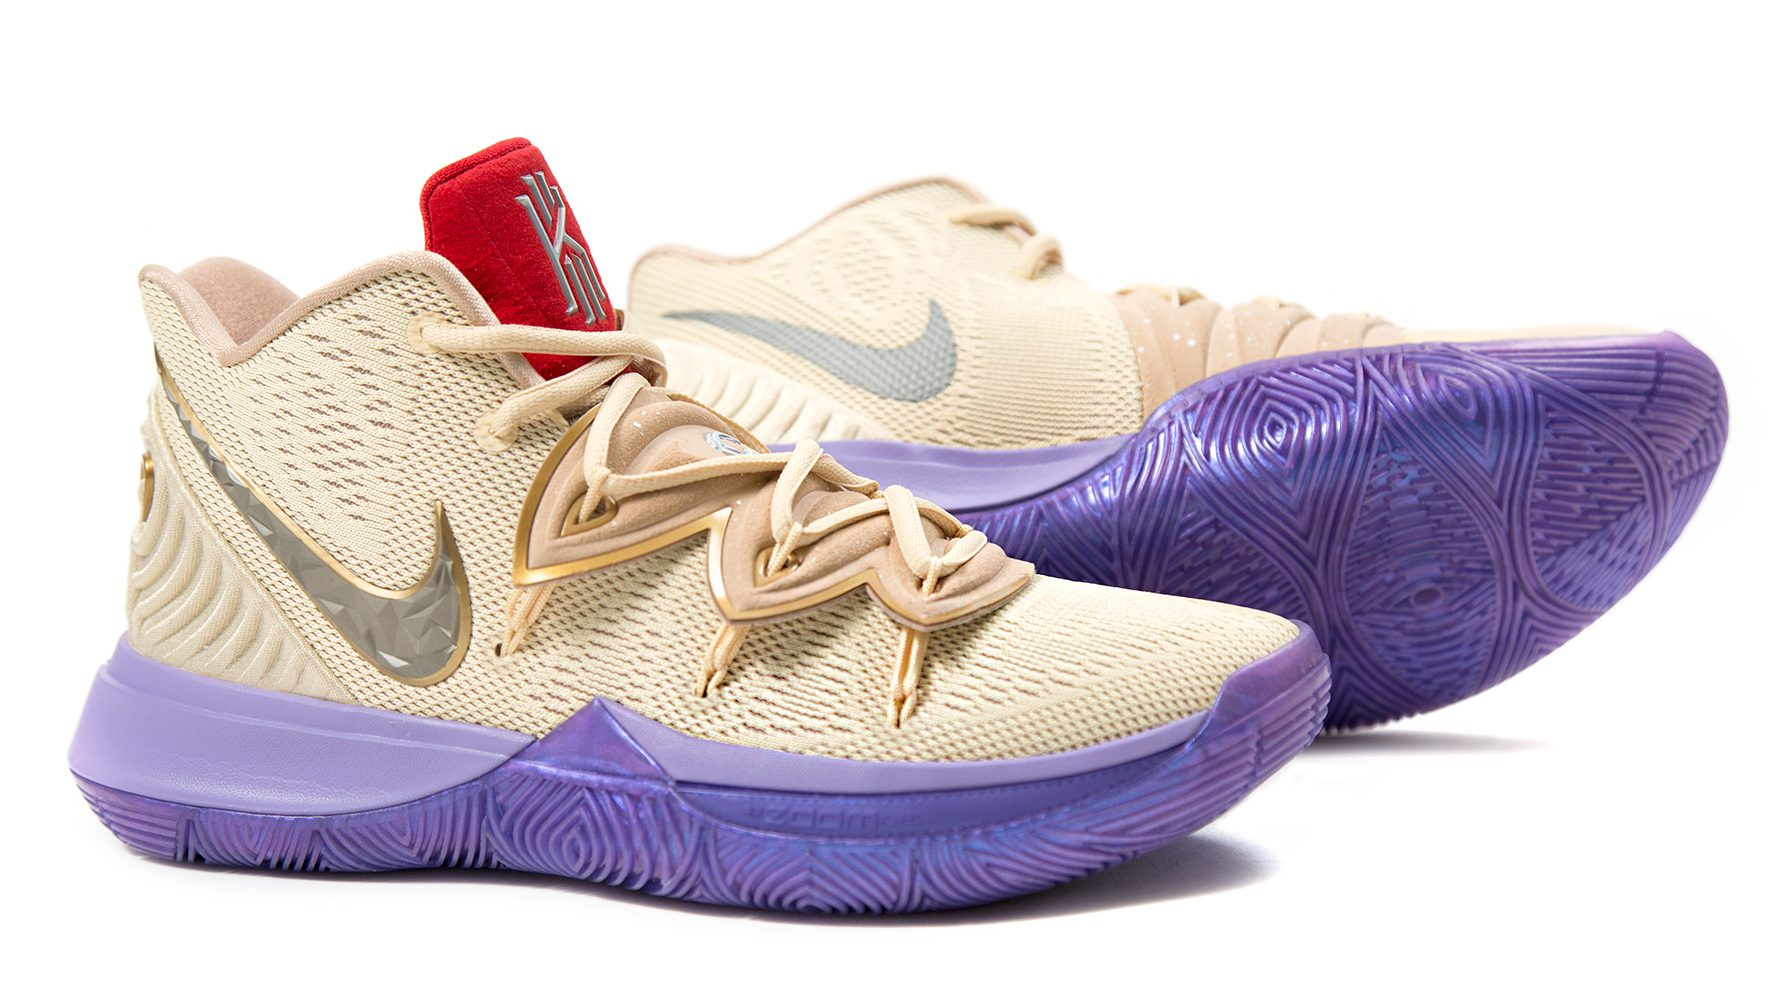 Nike Kyrie 5 'Ikhet' x Concepts